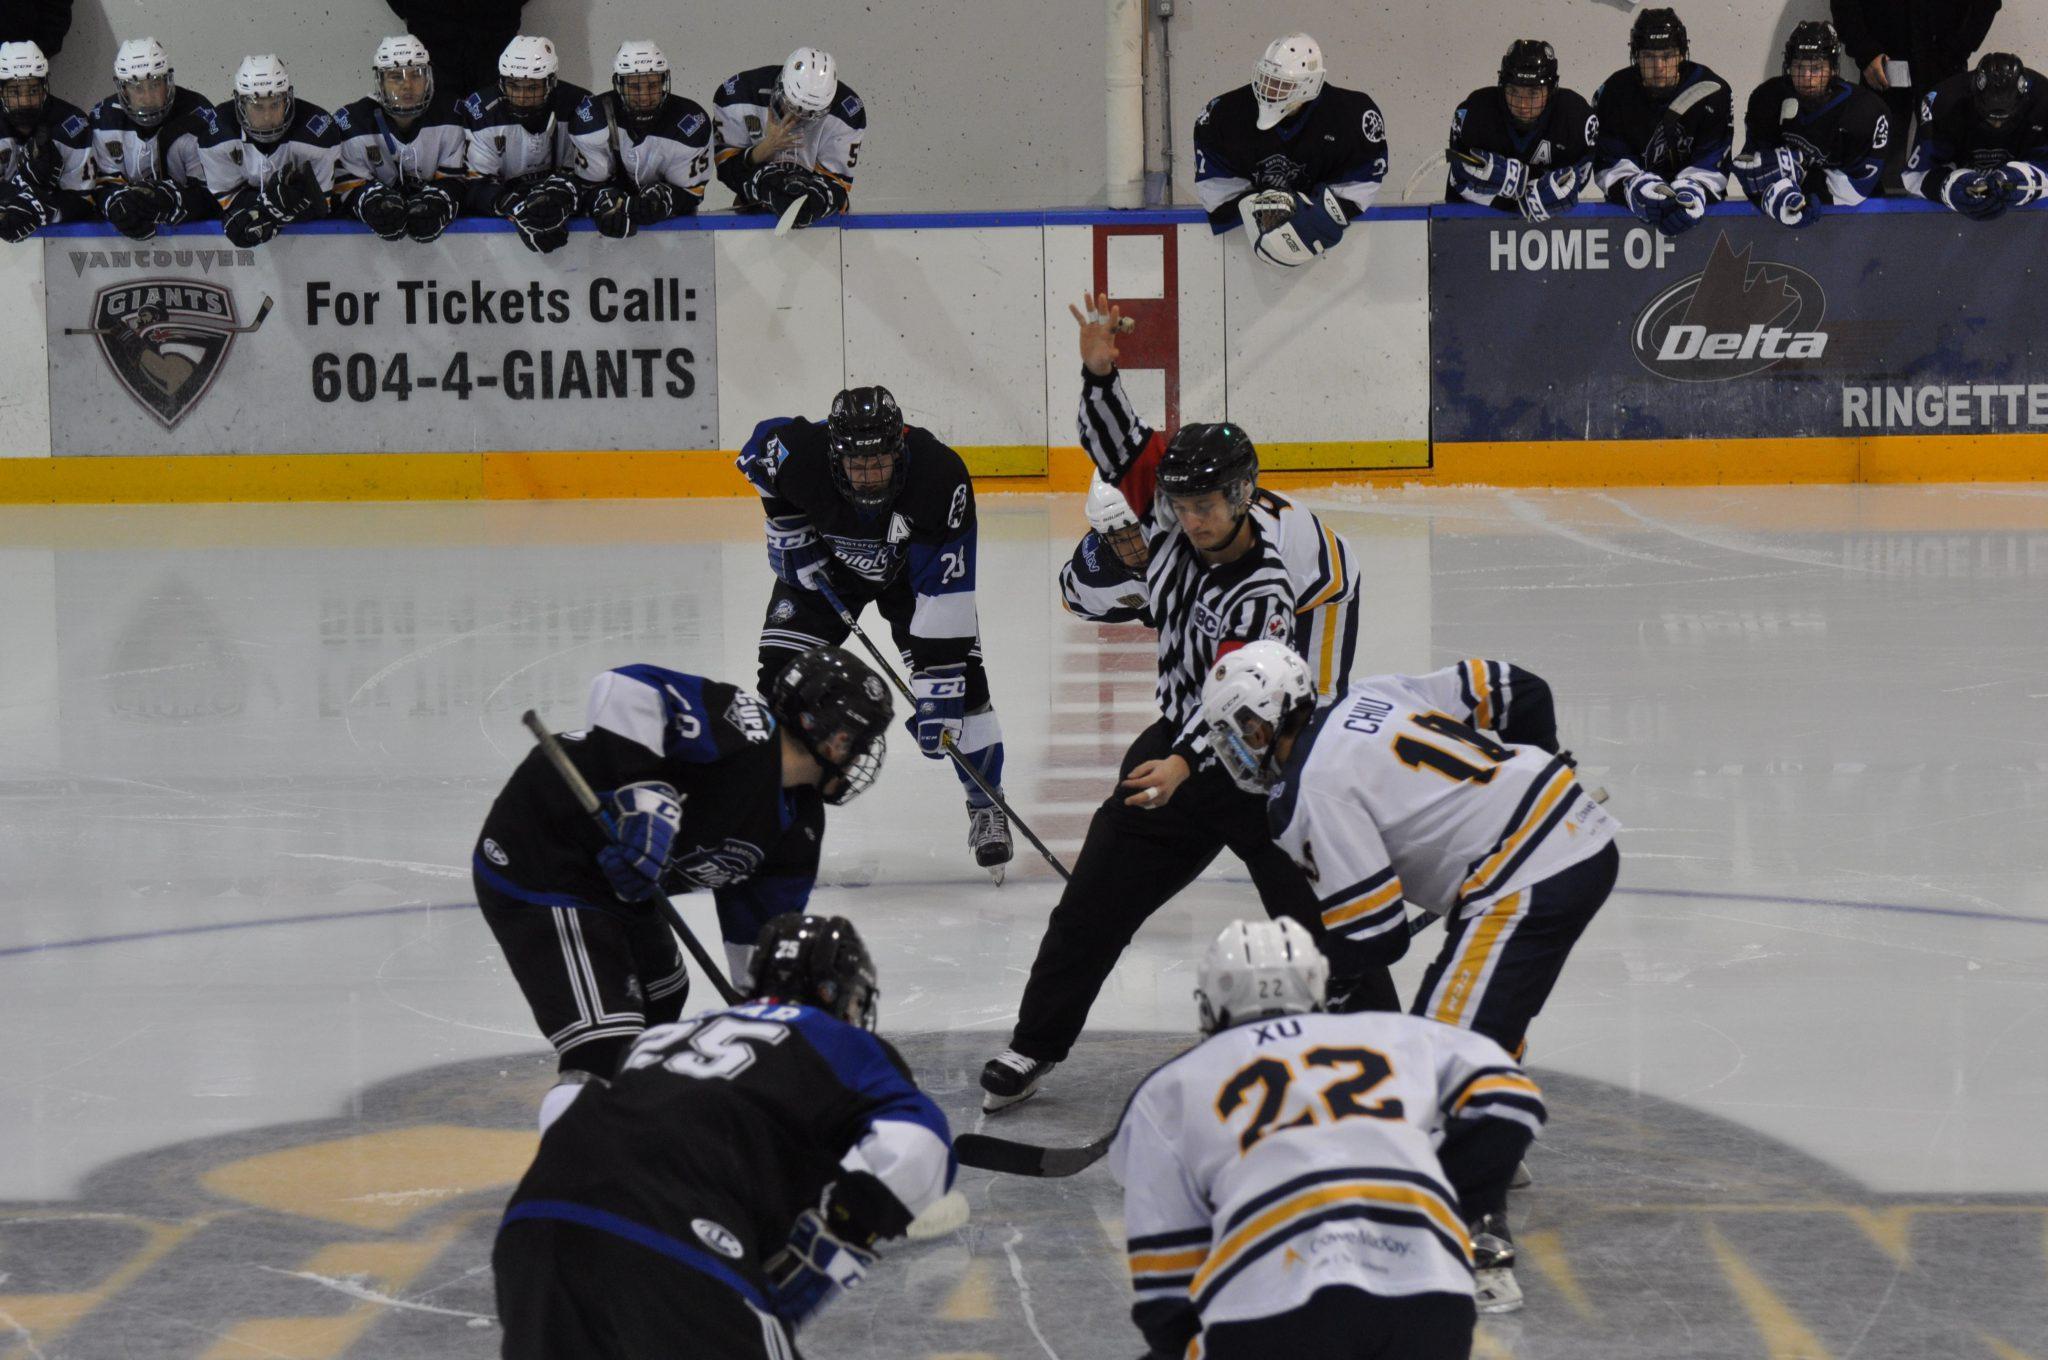 Abbotsford Pilots Fall to Ice Hawks 8-1